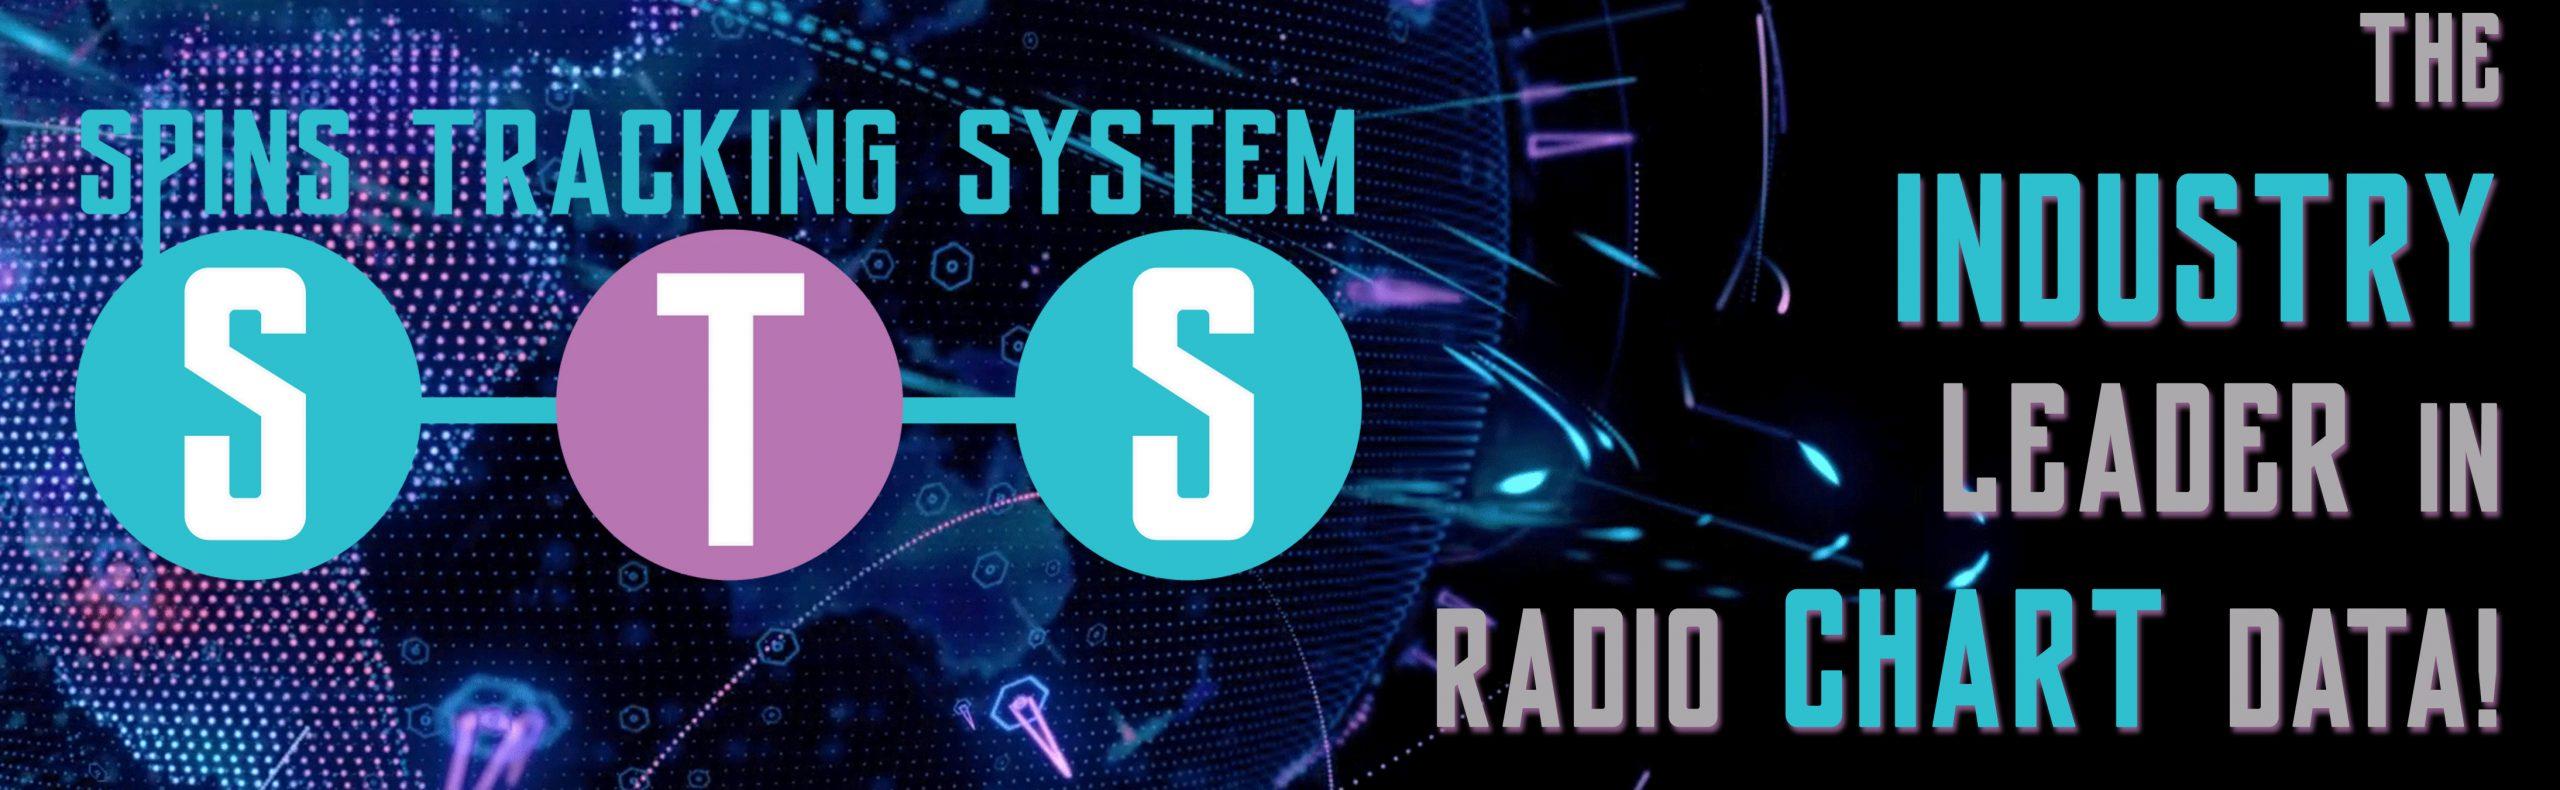 SpinsTrackingSystem